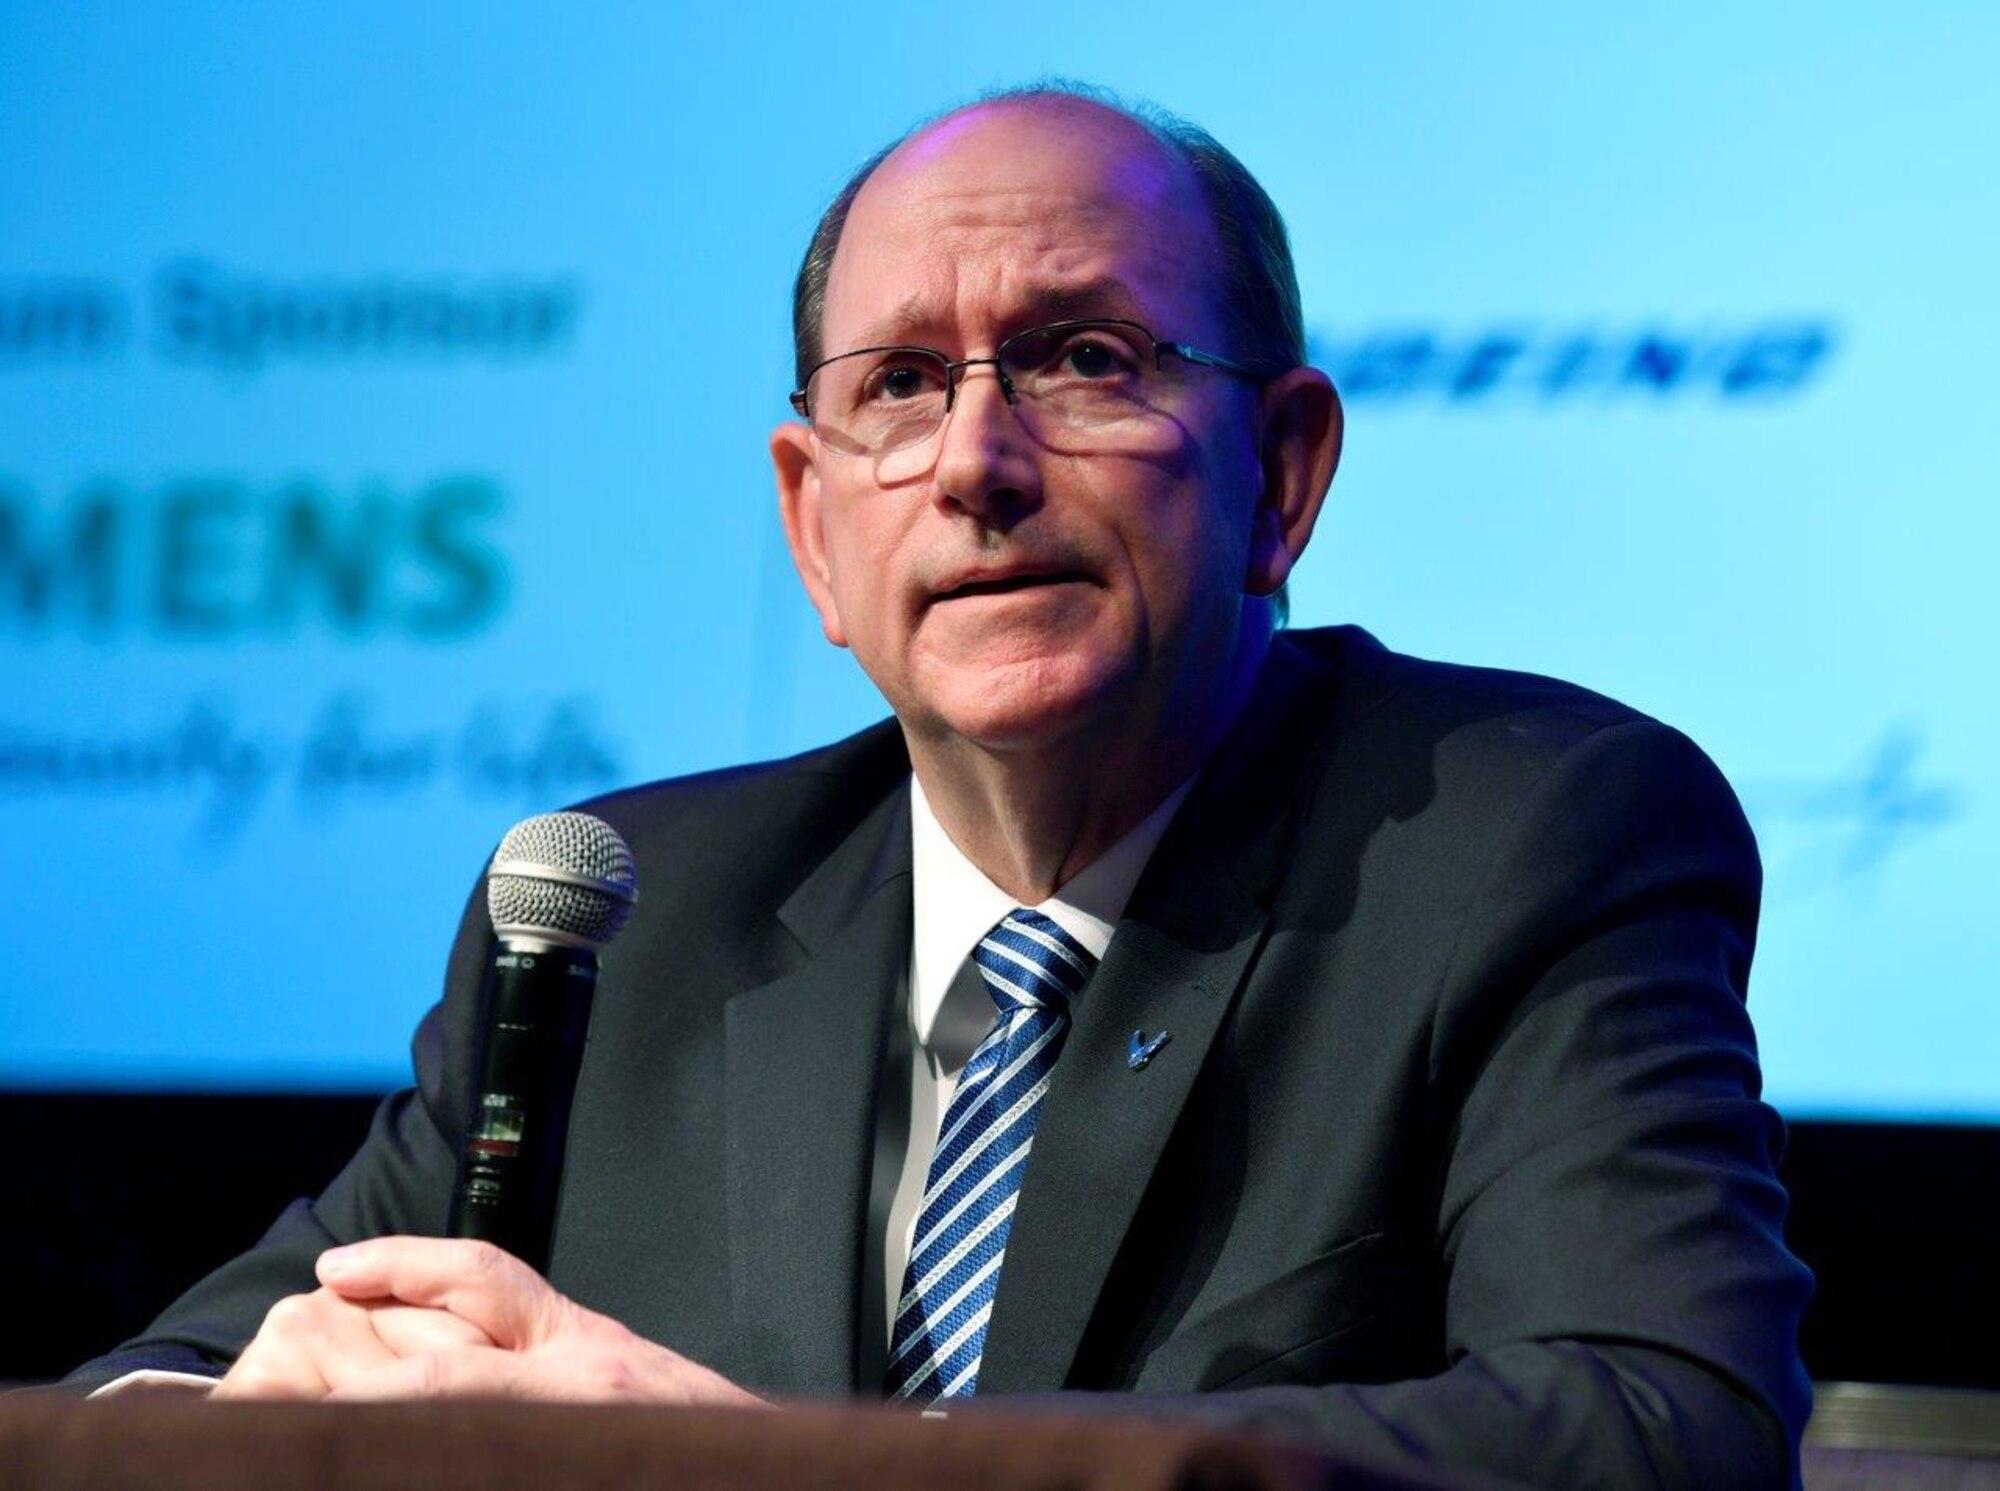 USecAF addresses innovation at symposium